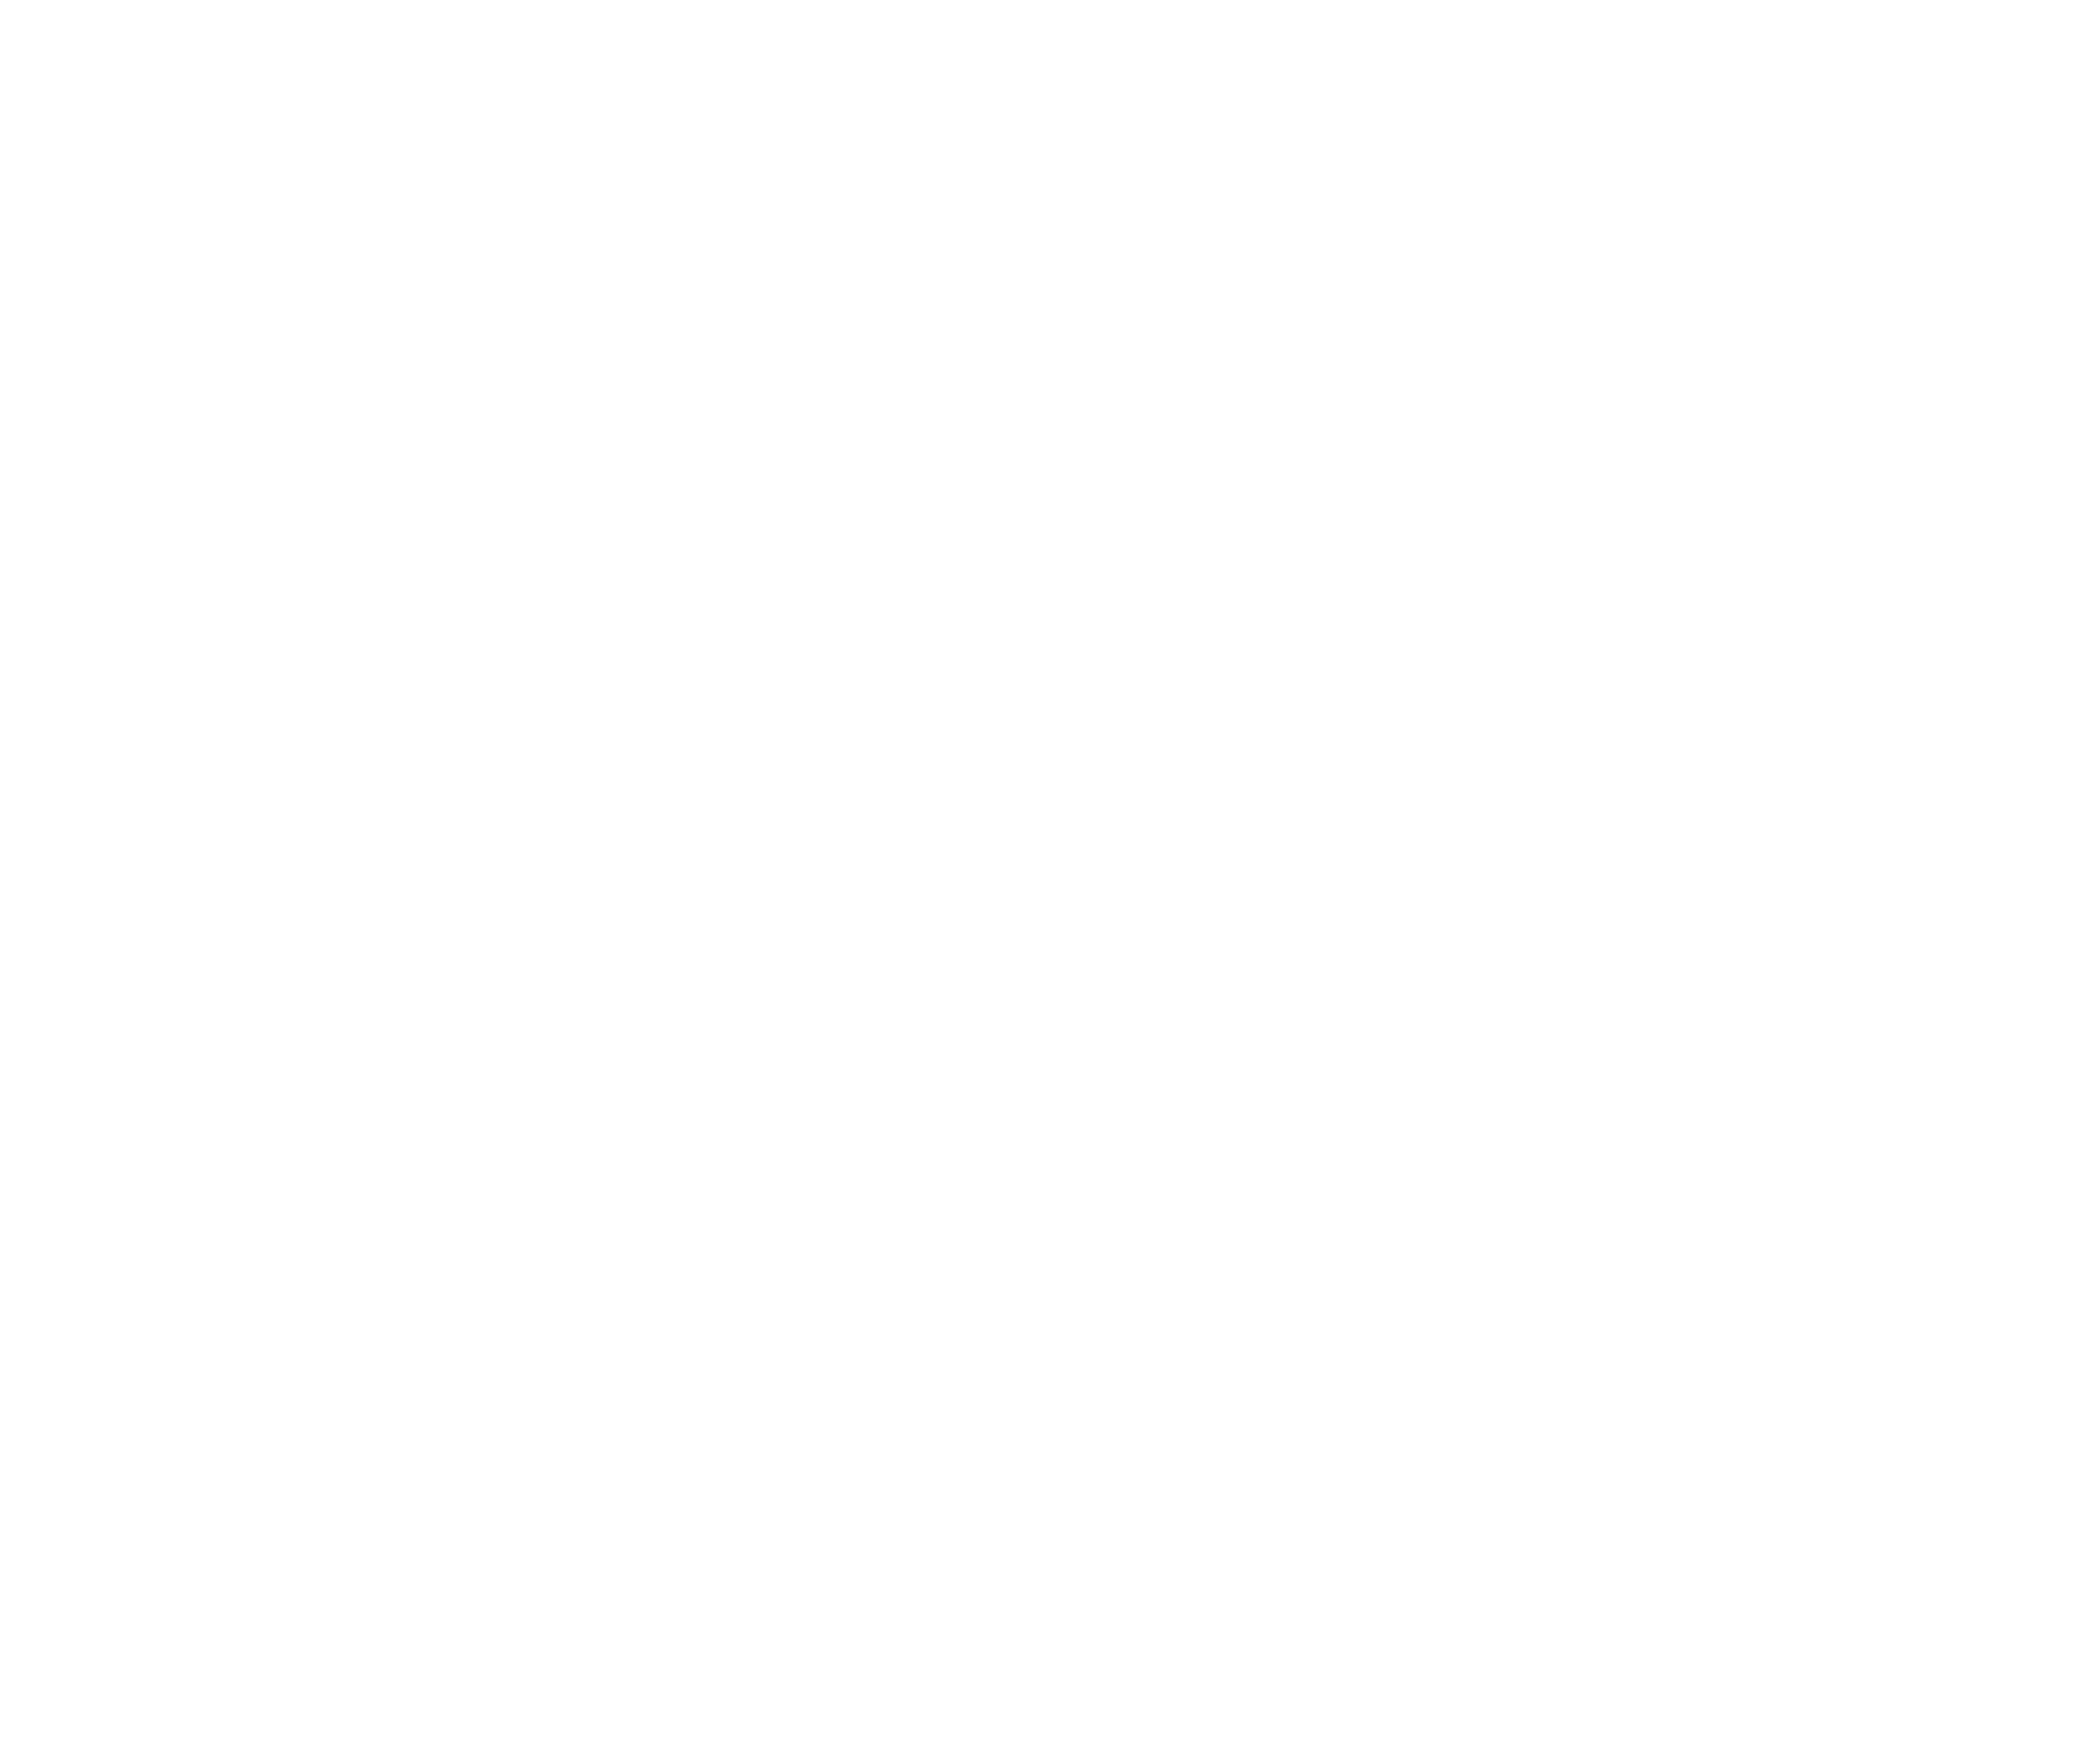 DVS Ongediertebestrijding